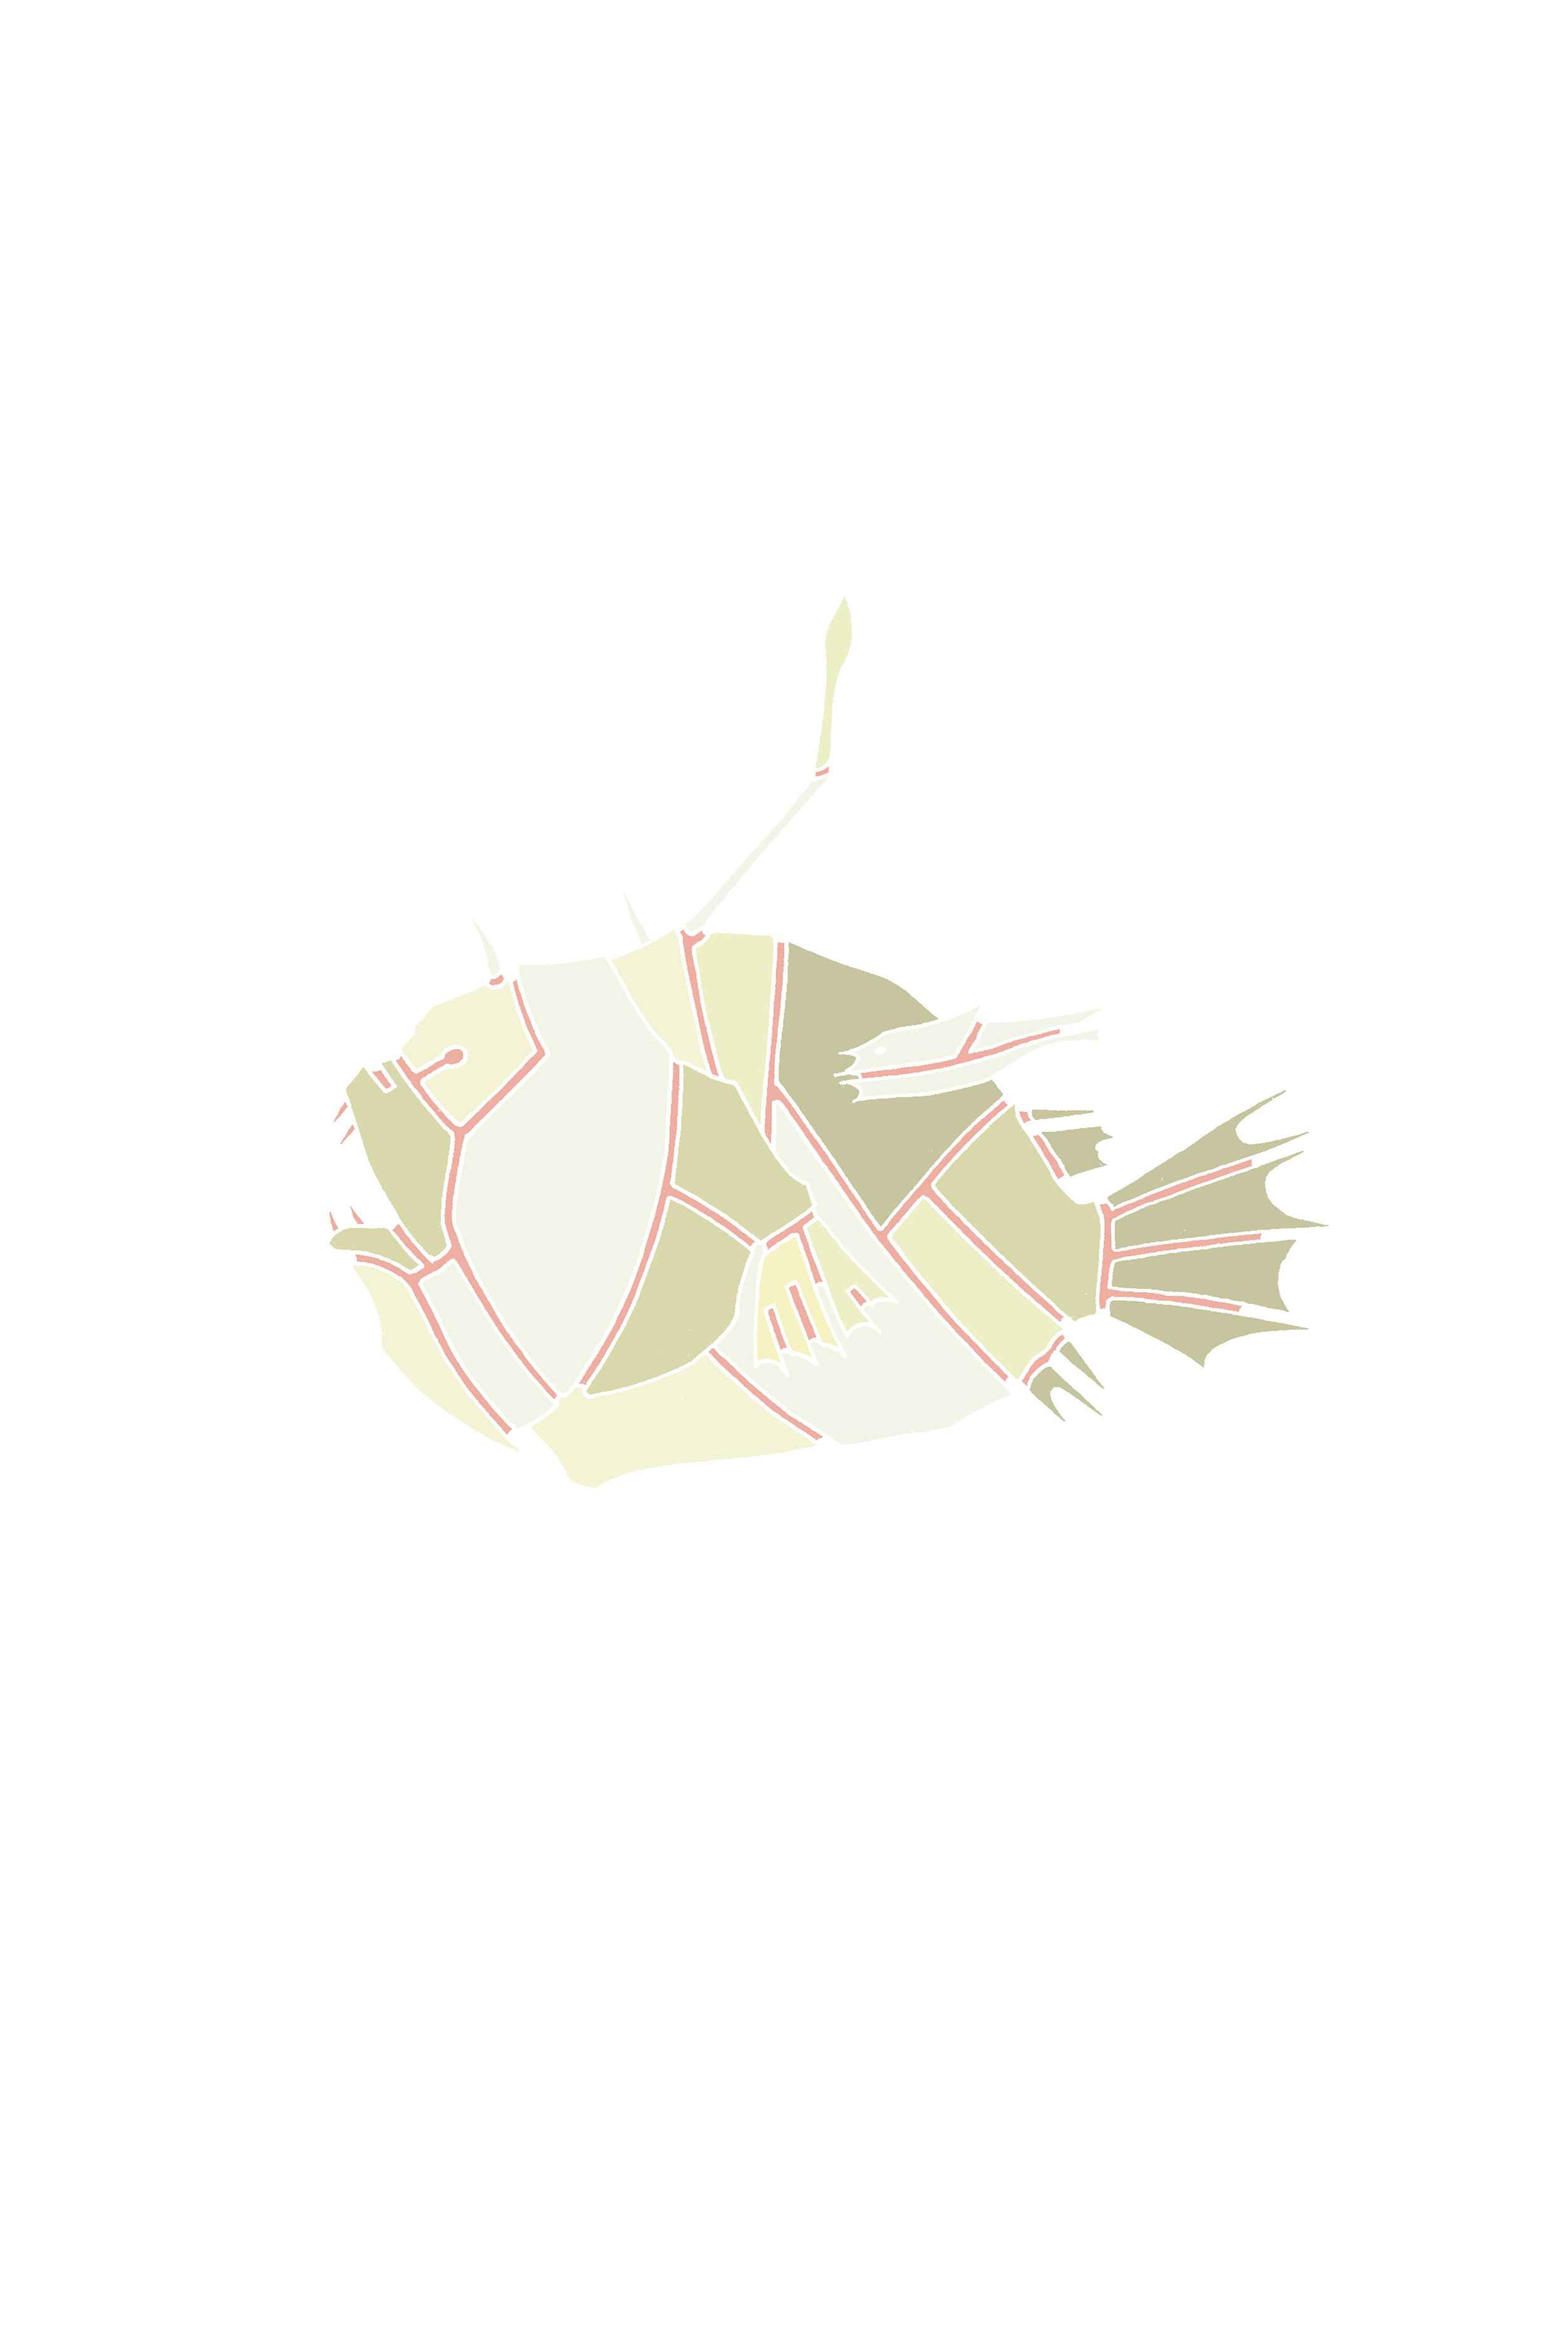 halfMOTHER.A.FAIRYTALE.RGB.jpg